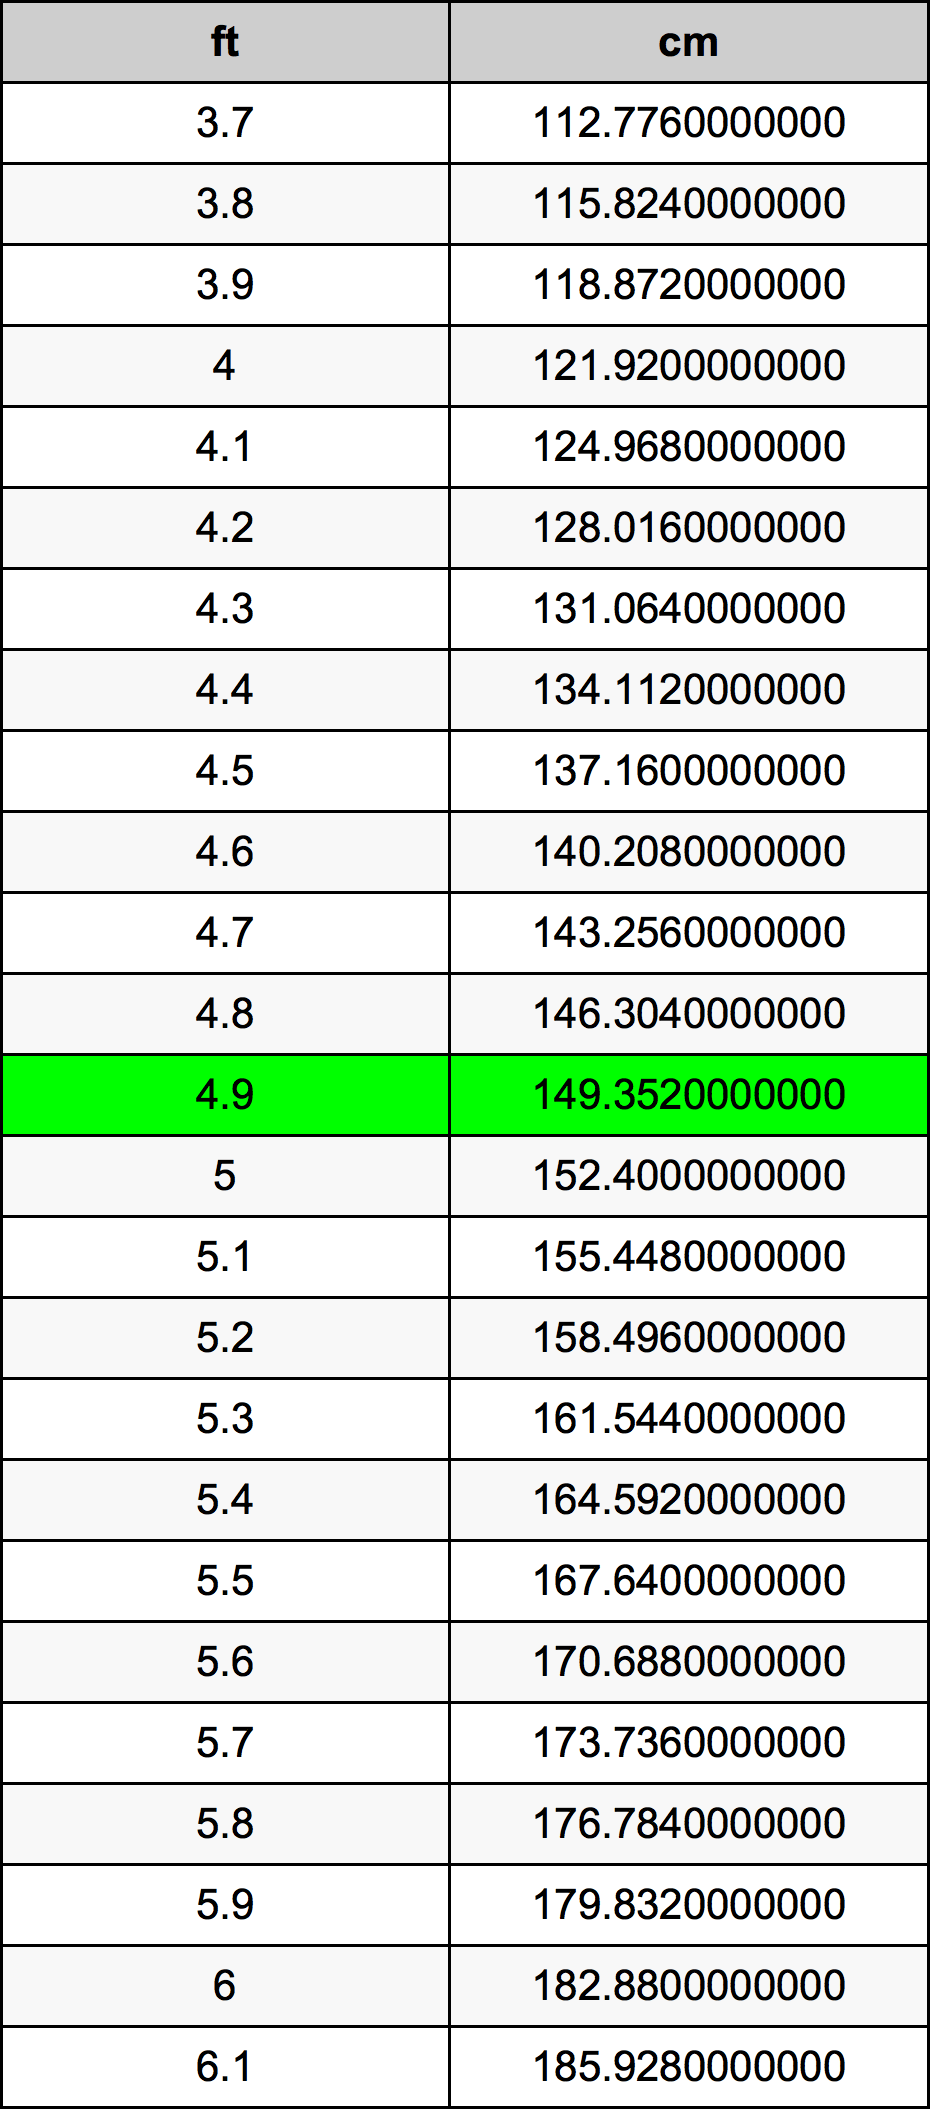 49 Feet To Centimeters Converter 49 Ft To Cm Converter